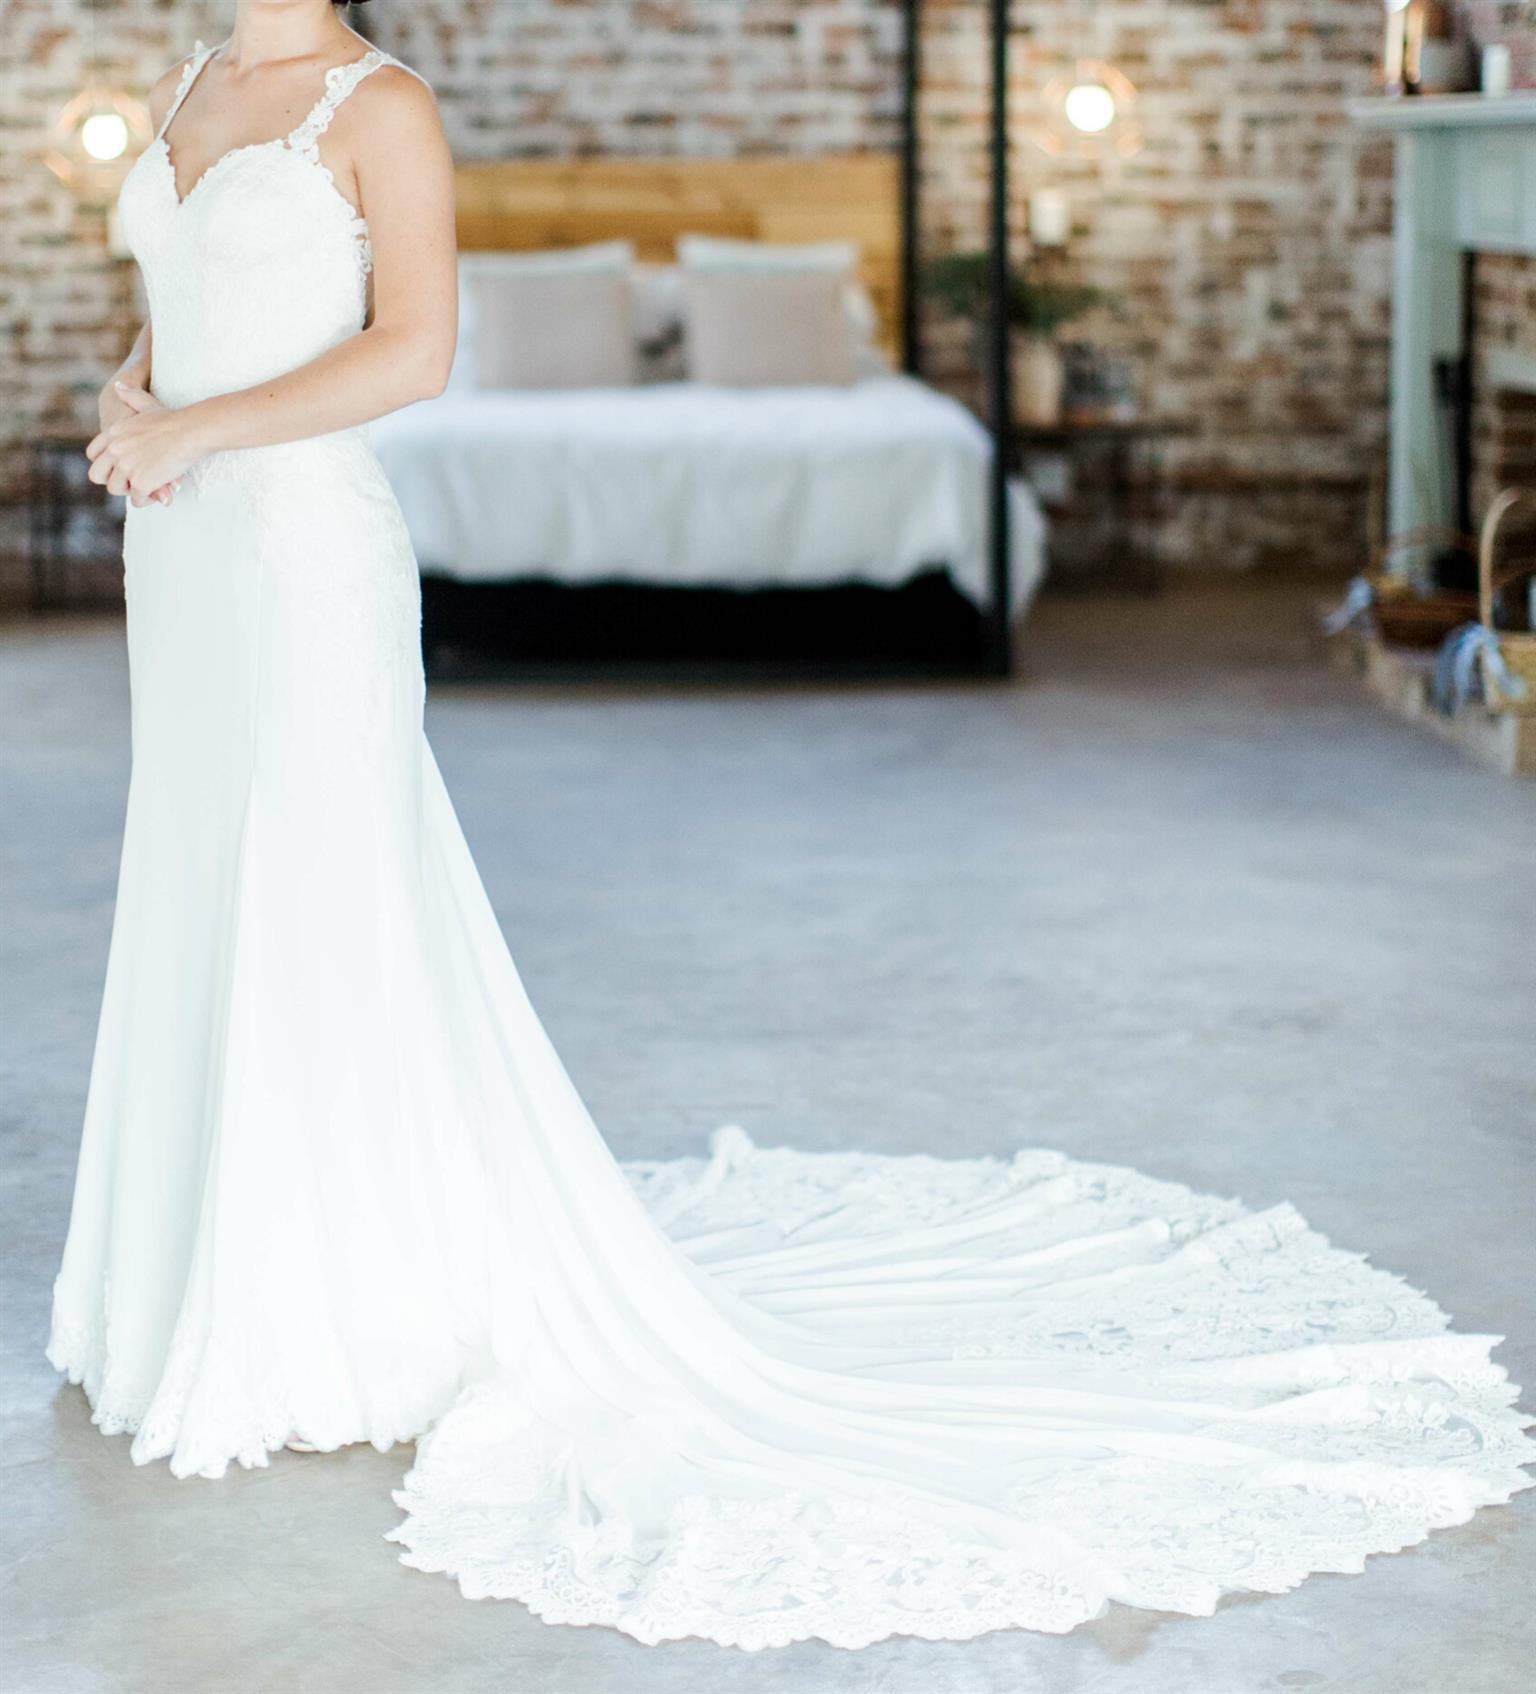 Fancy Wedding Gowns Australia Gift - All Wedding Dresses ...